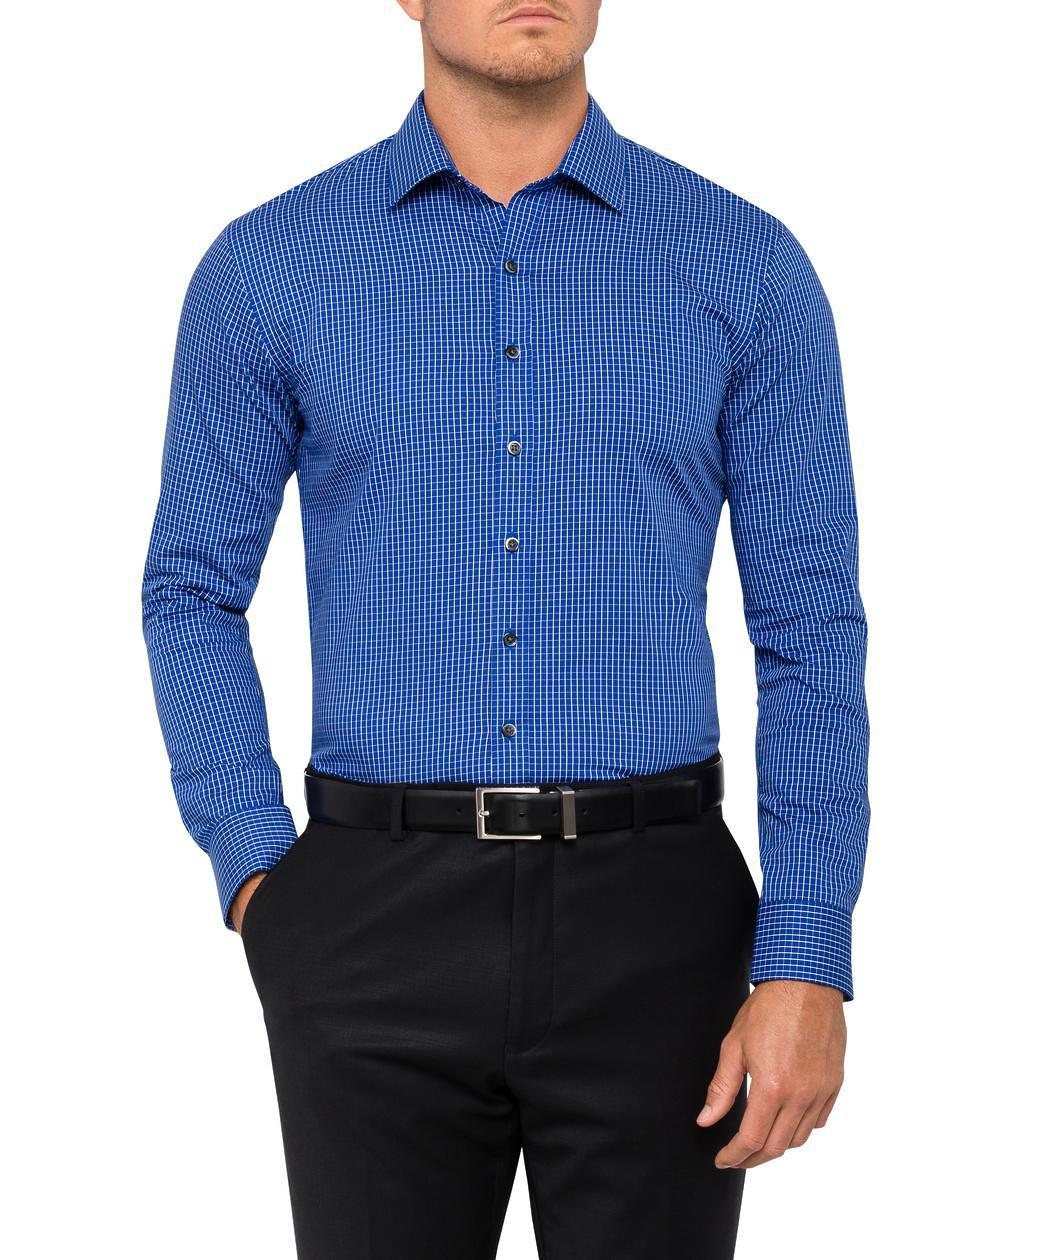 7b6da3f729 ... Mens Slim Fit Shirt Royal Blue Check. Product Image · Image 1 ...